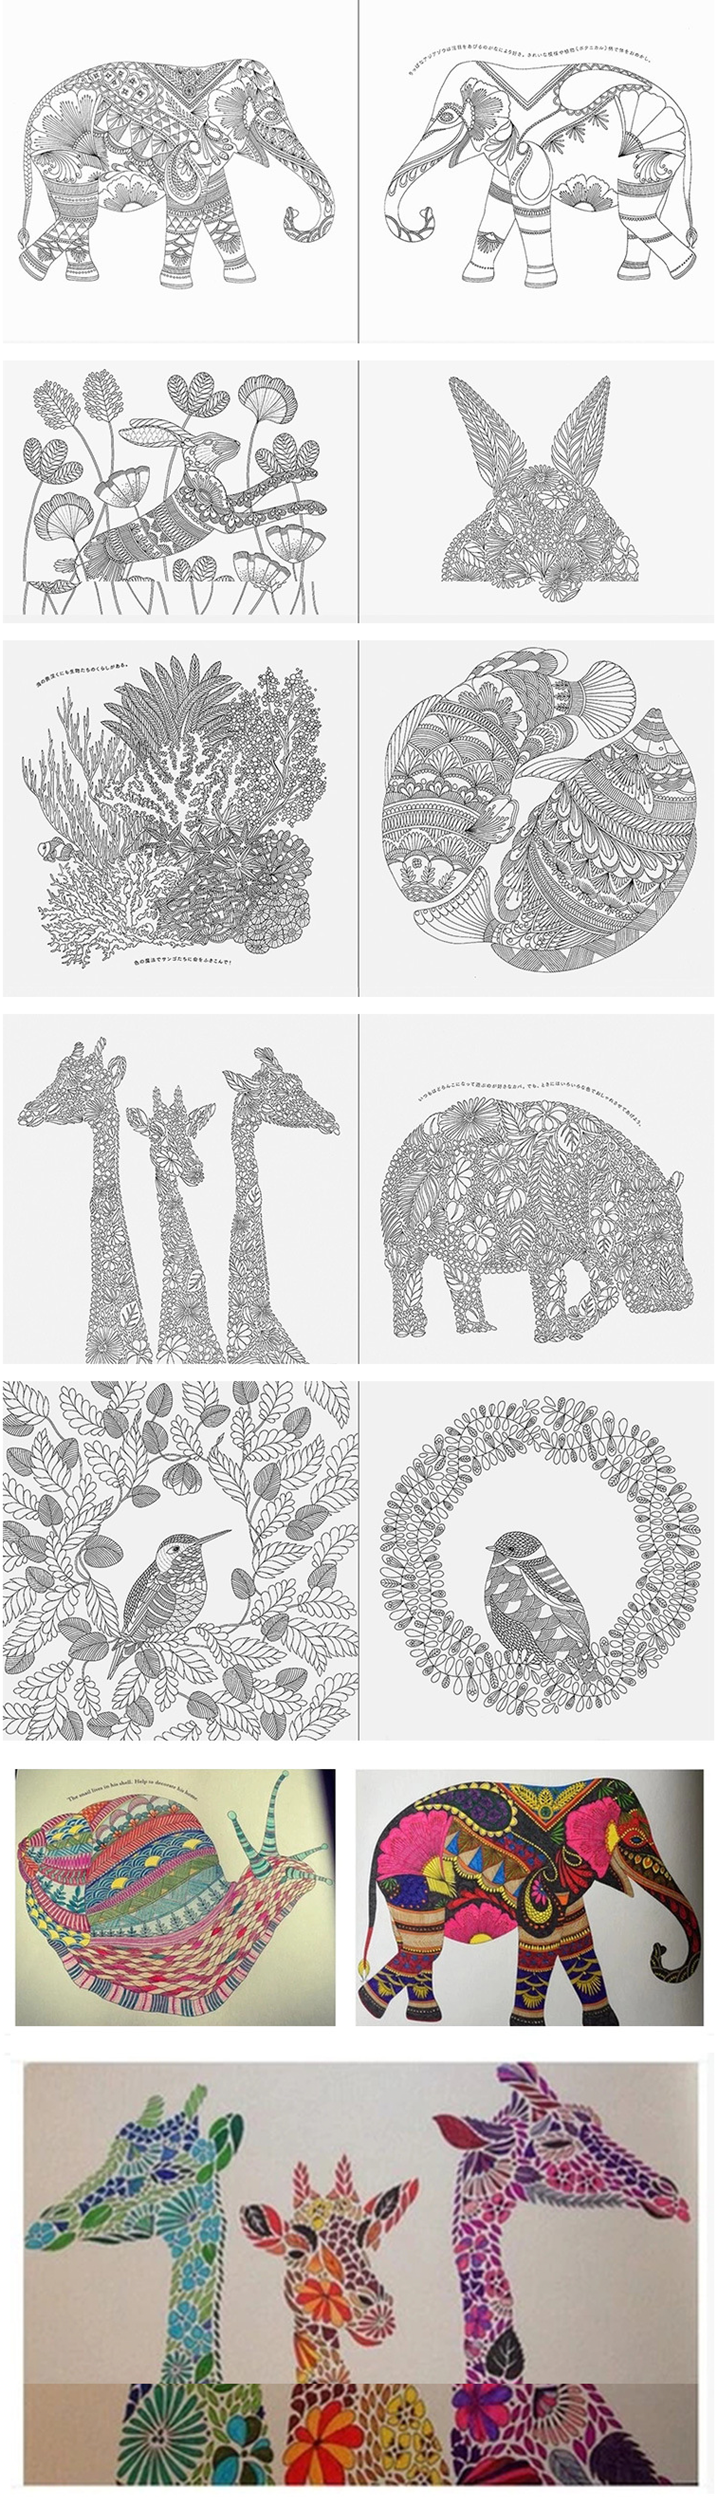 版动物王国animal kingdom填色书